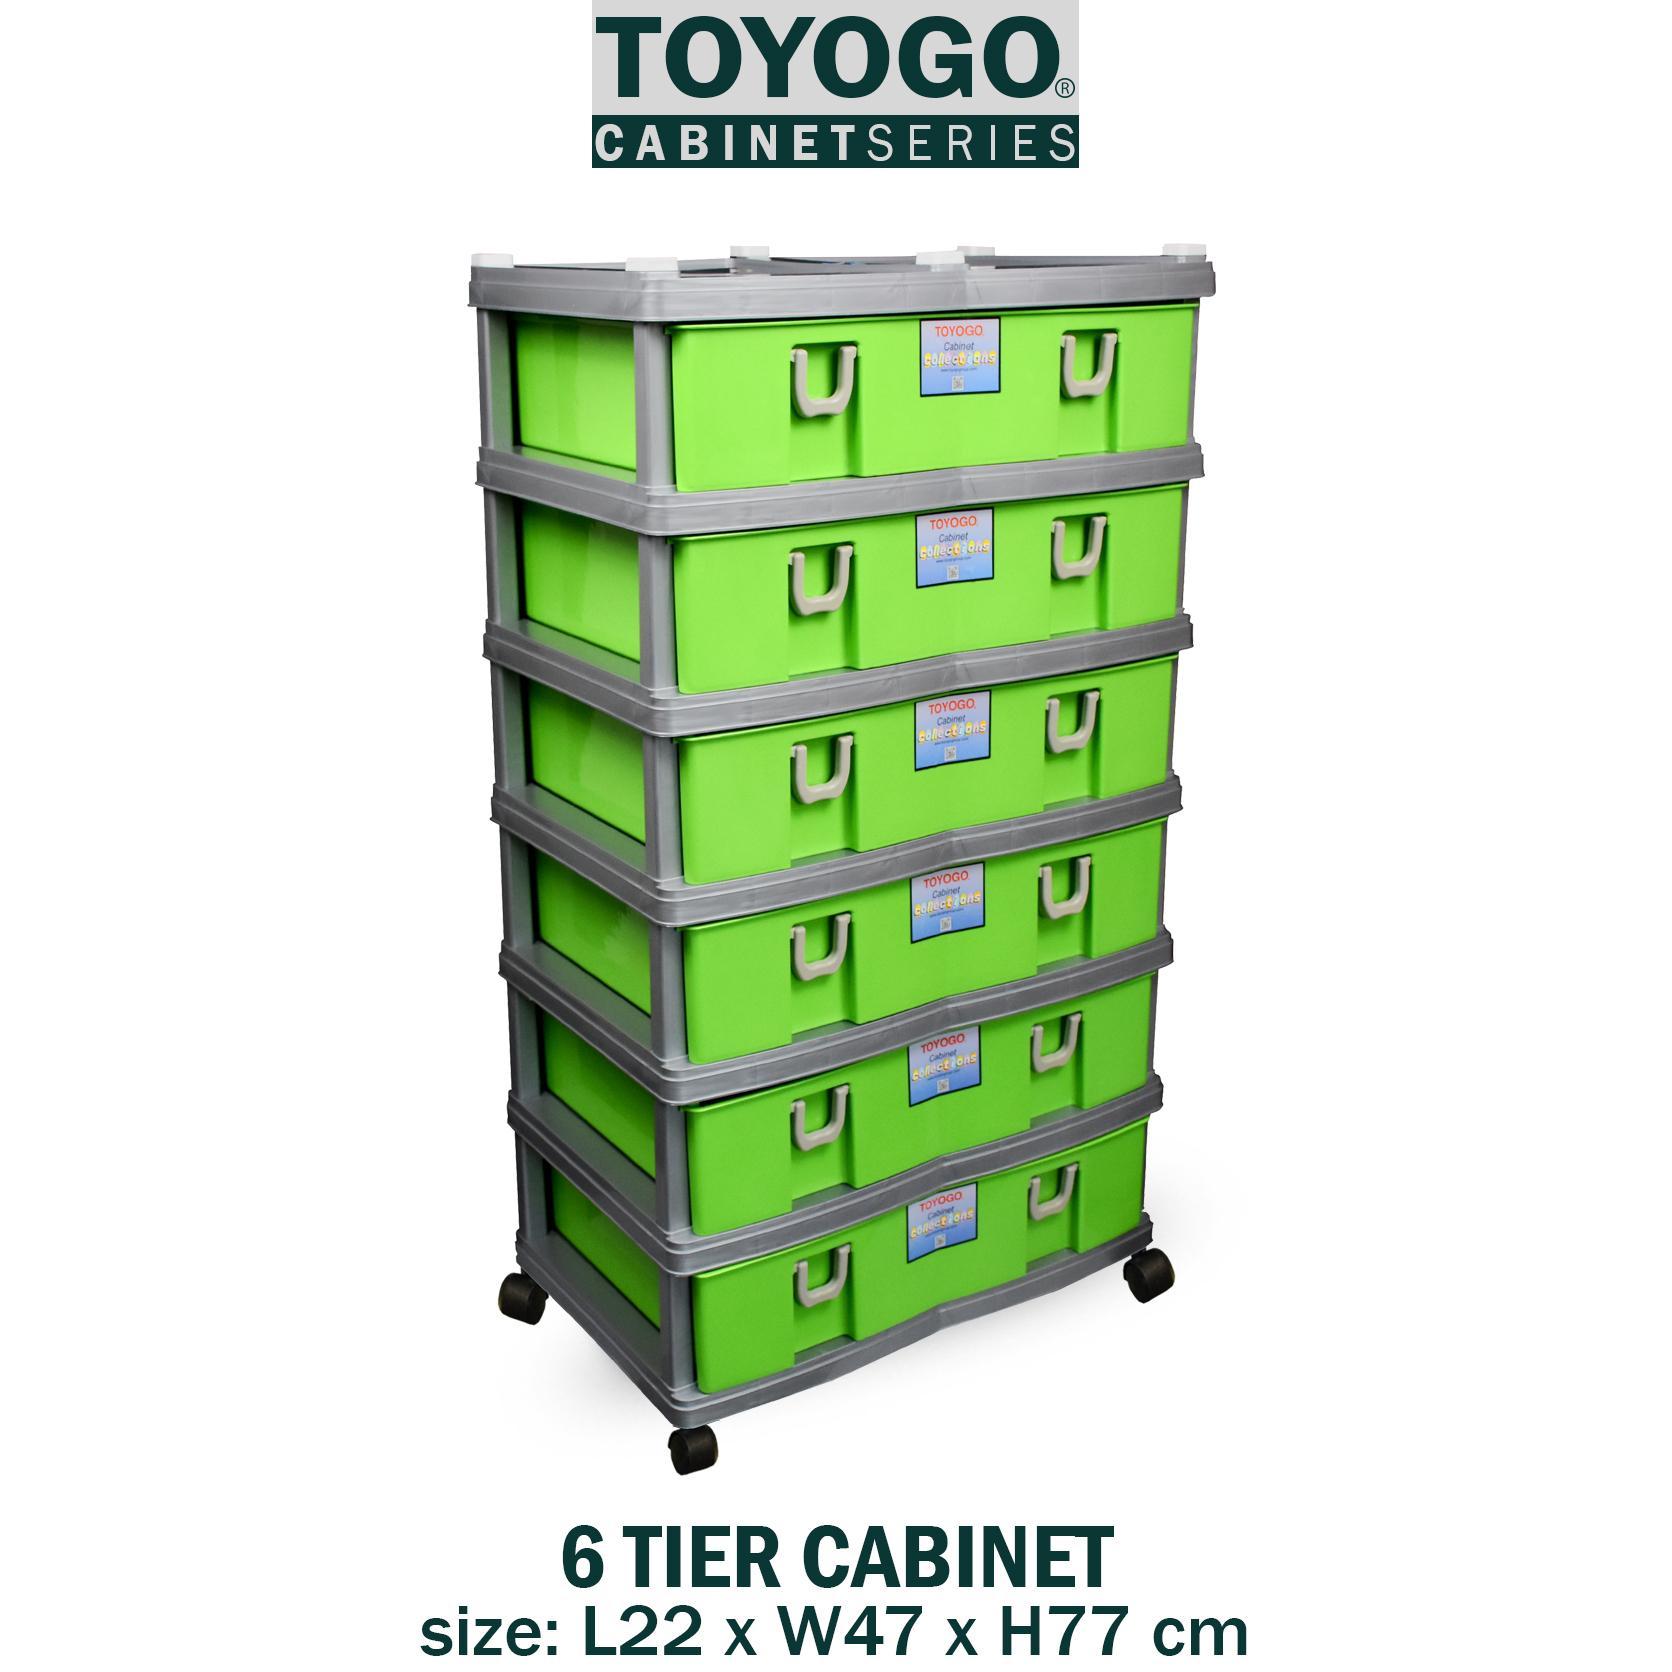 [902-6] TOYOGO - PLASTIC STORAGE CABINET/DRAWER WITH WHEELS (6 TIER)